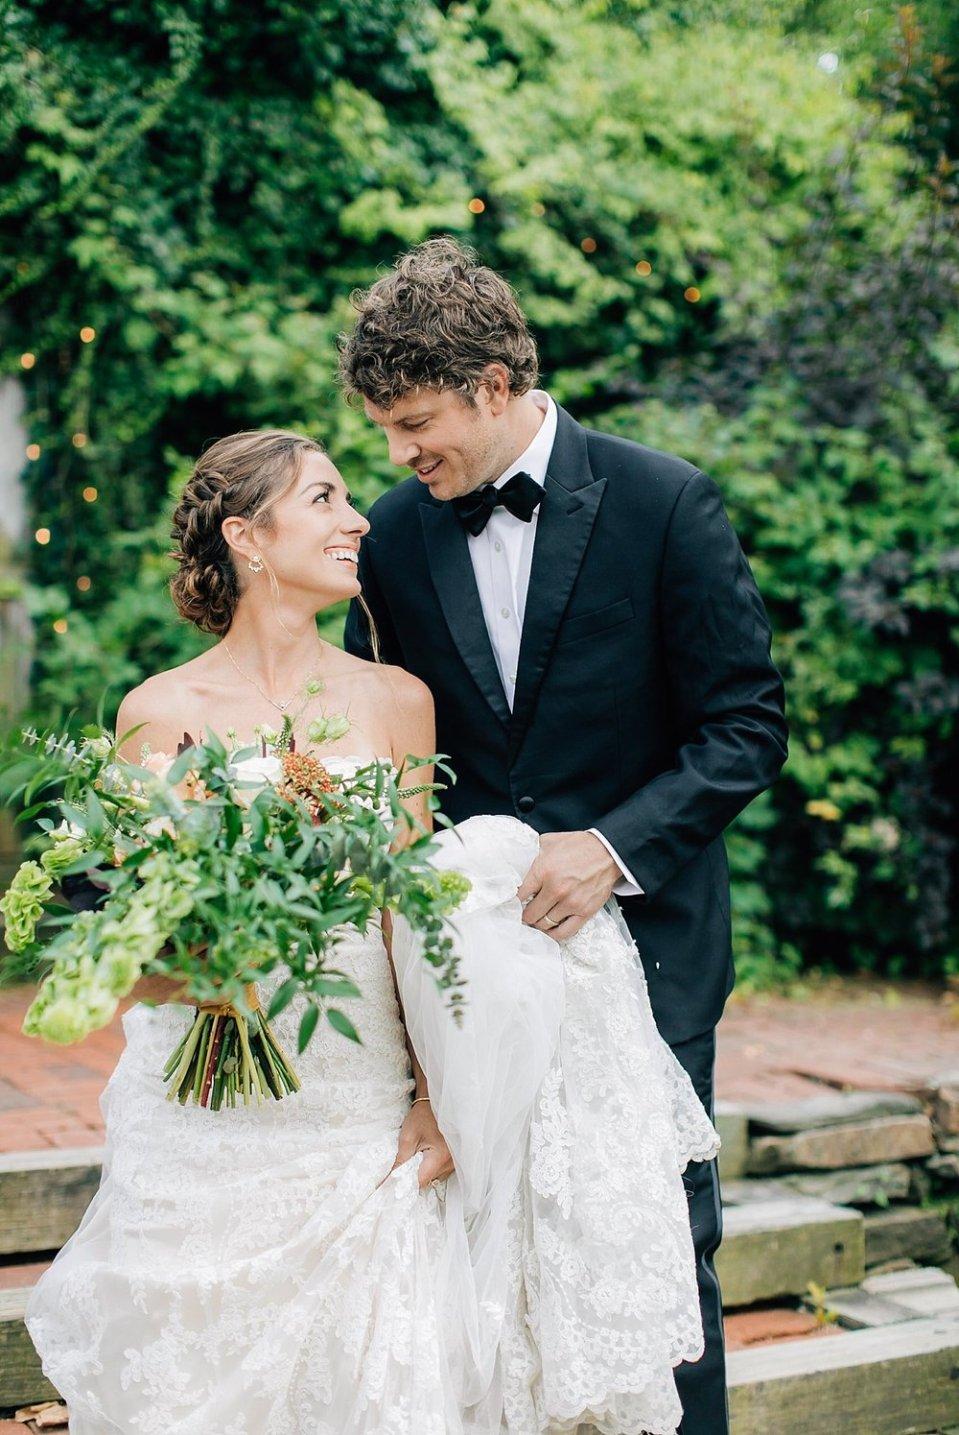 terrain gatherings glen mills pa romantic garden wedding photography magdalena studios 0018